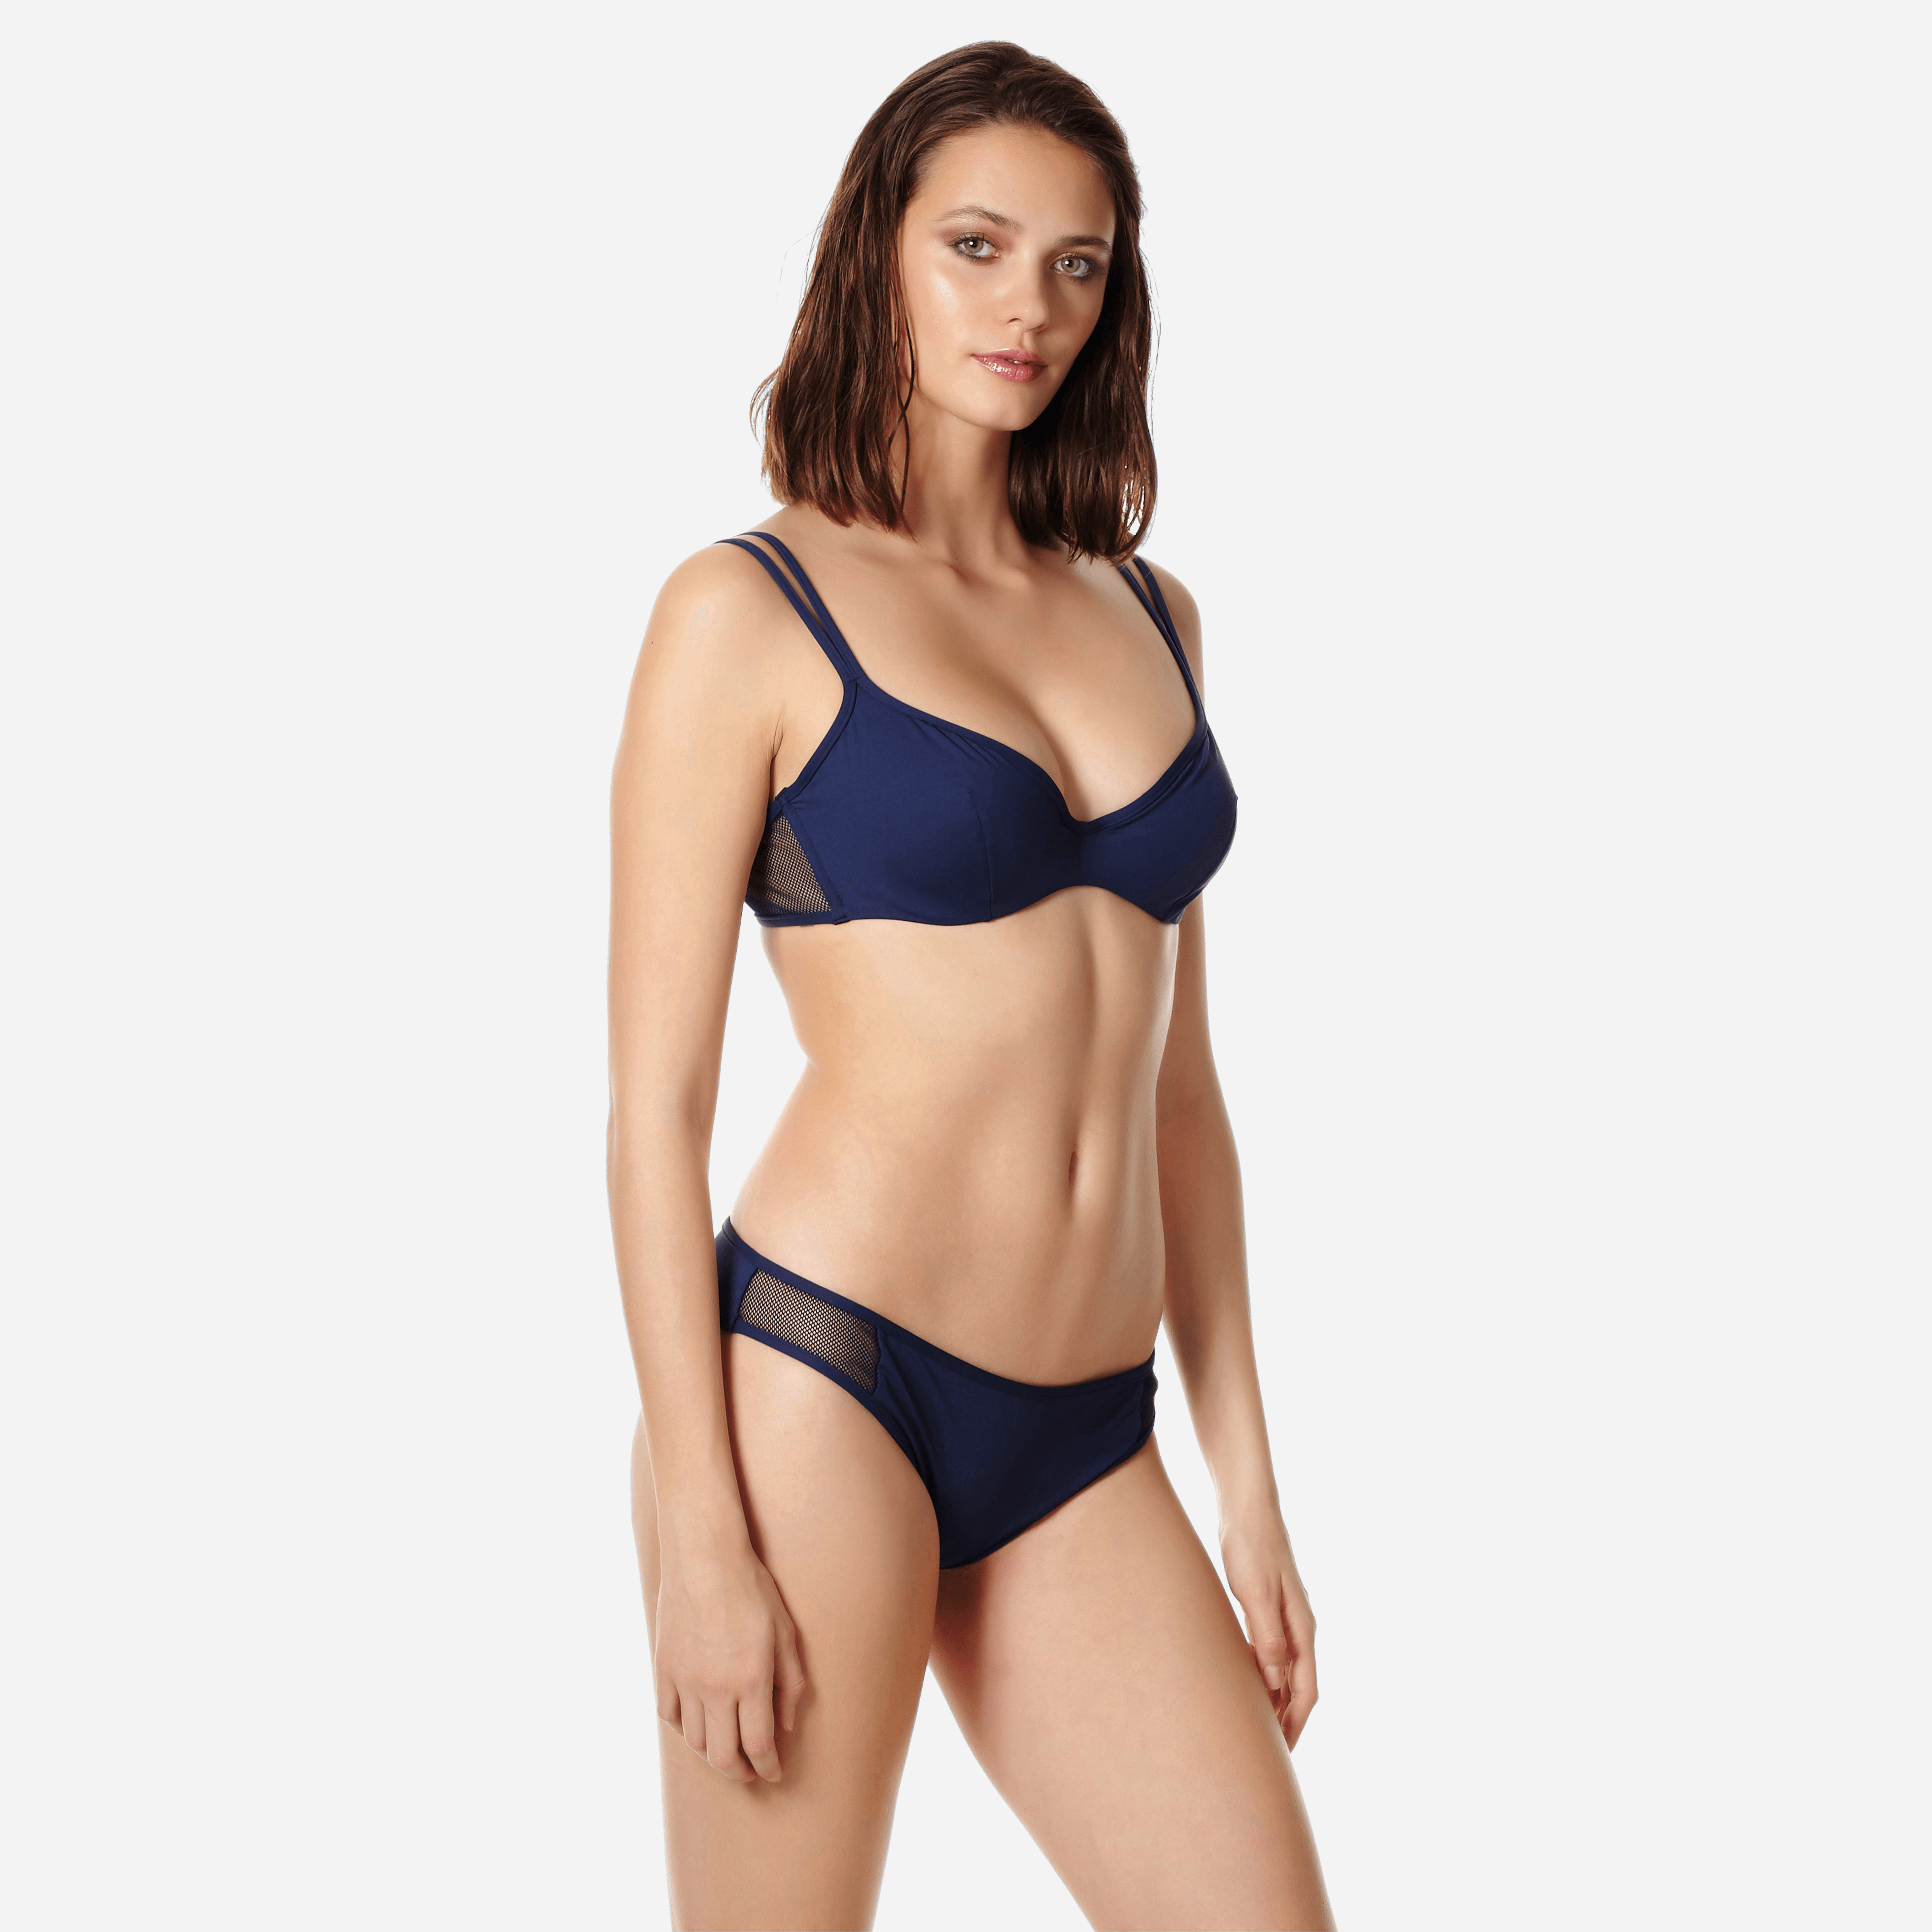 VILEBREQUIN | Women Swimwear - Women Bikini Top With Underwires Solid Net - SWIMMING TRUNK - FAUSTE - Blue - XXS - Vilebrequin | Goxip